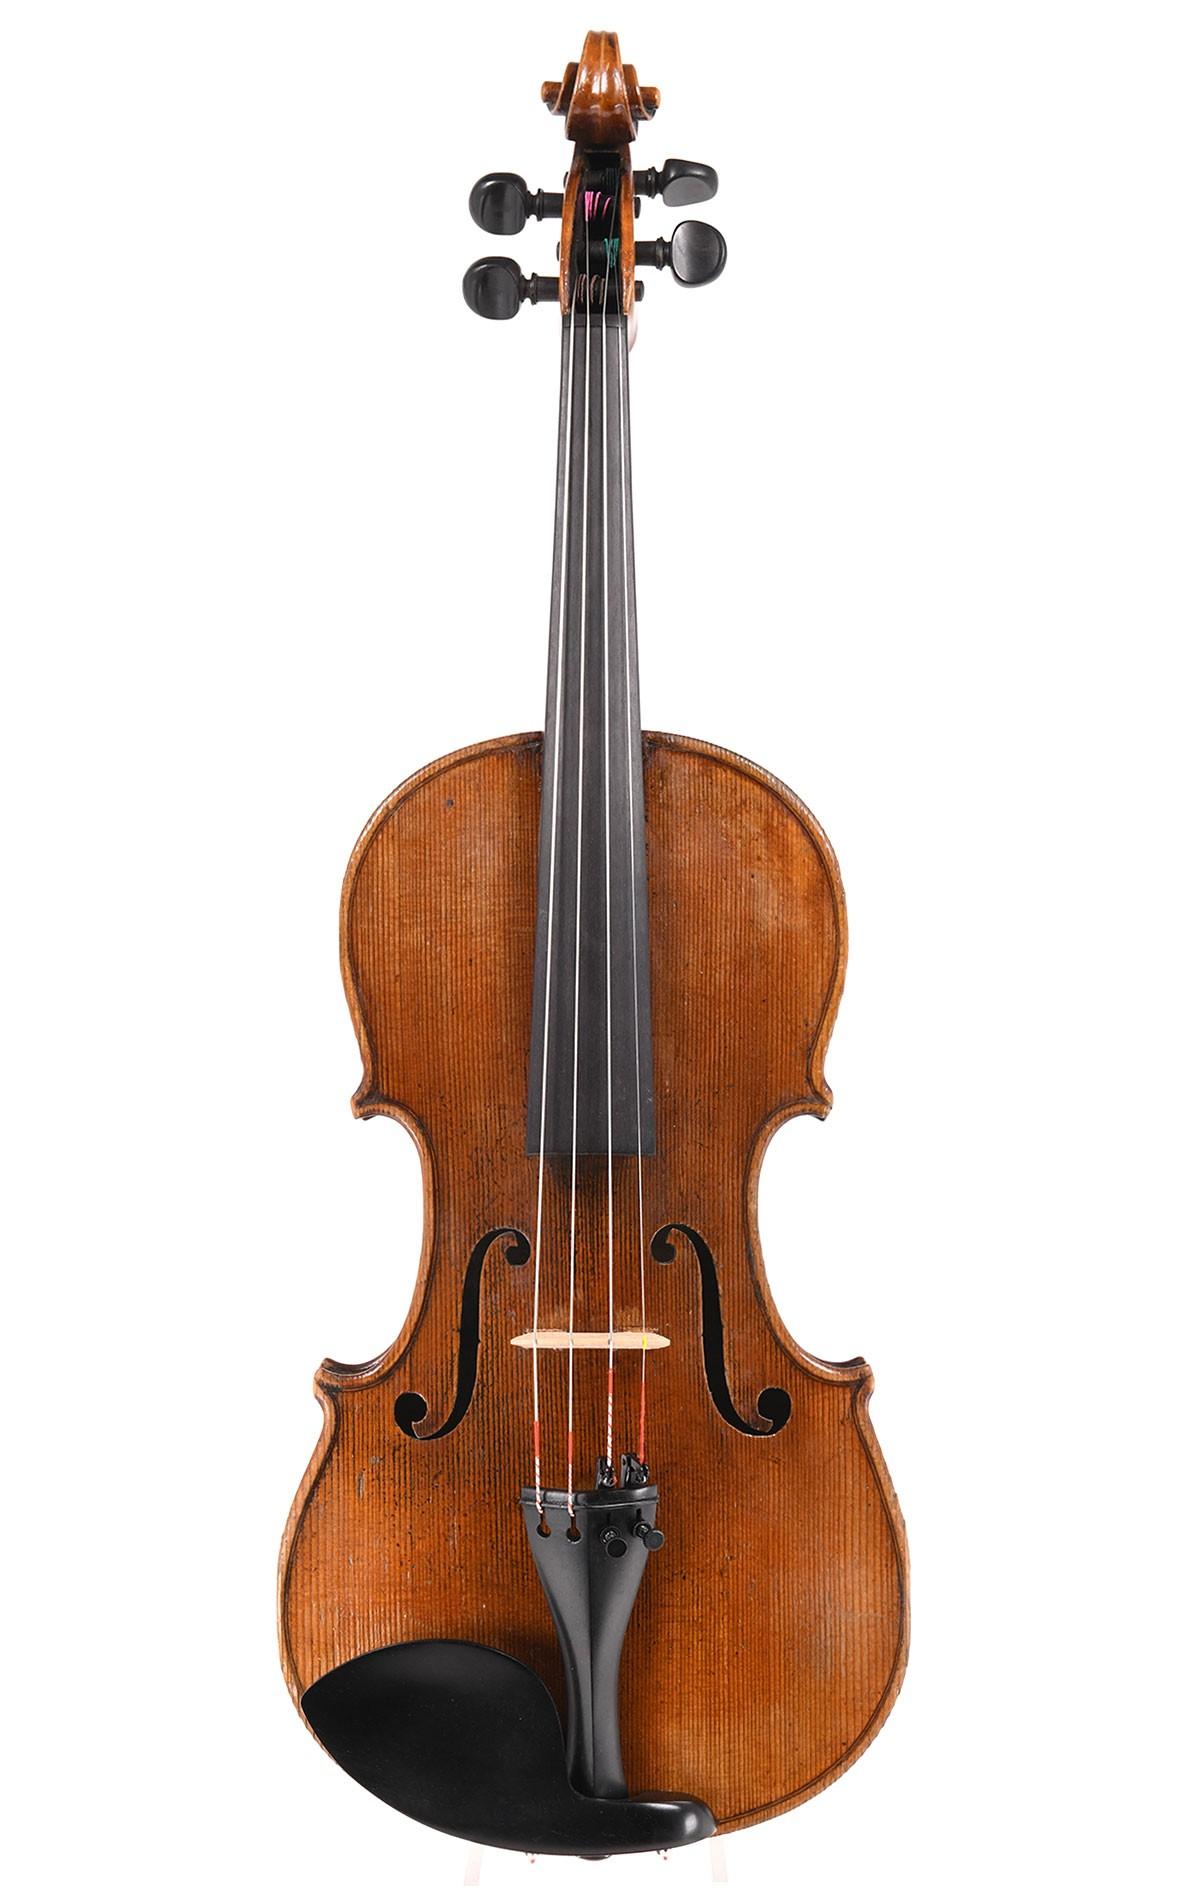 Wolff brothers violin, Kreuznach